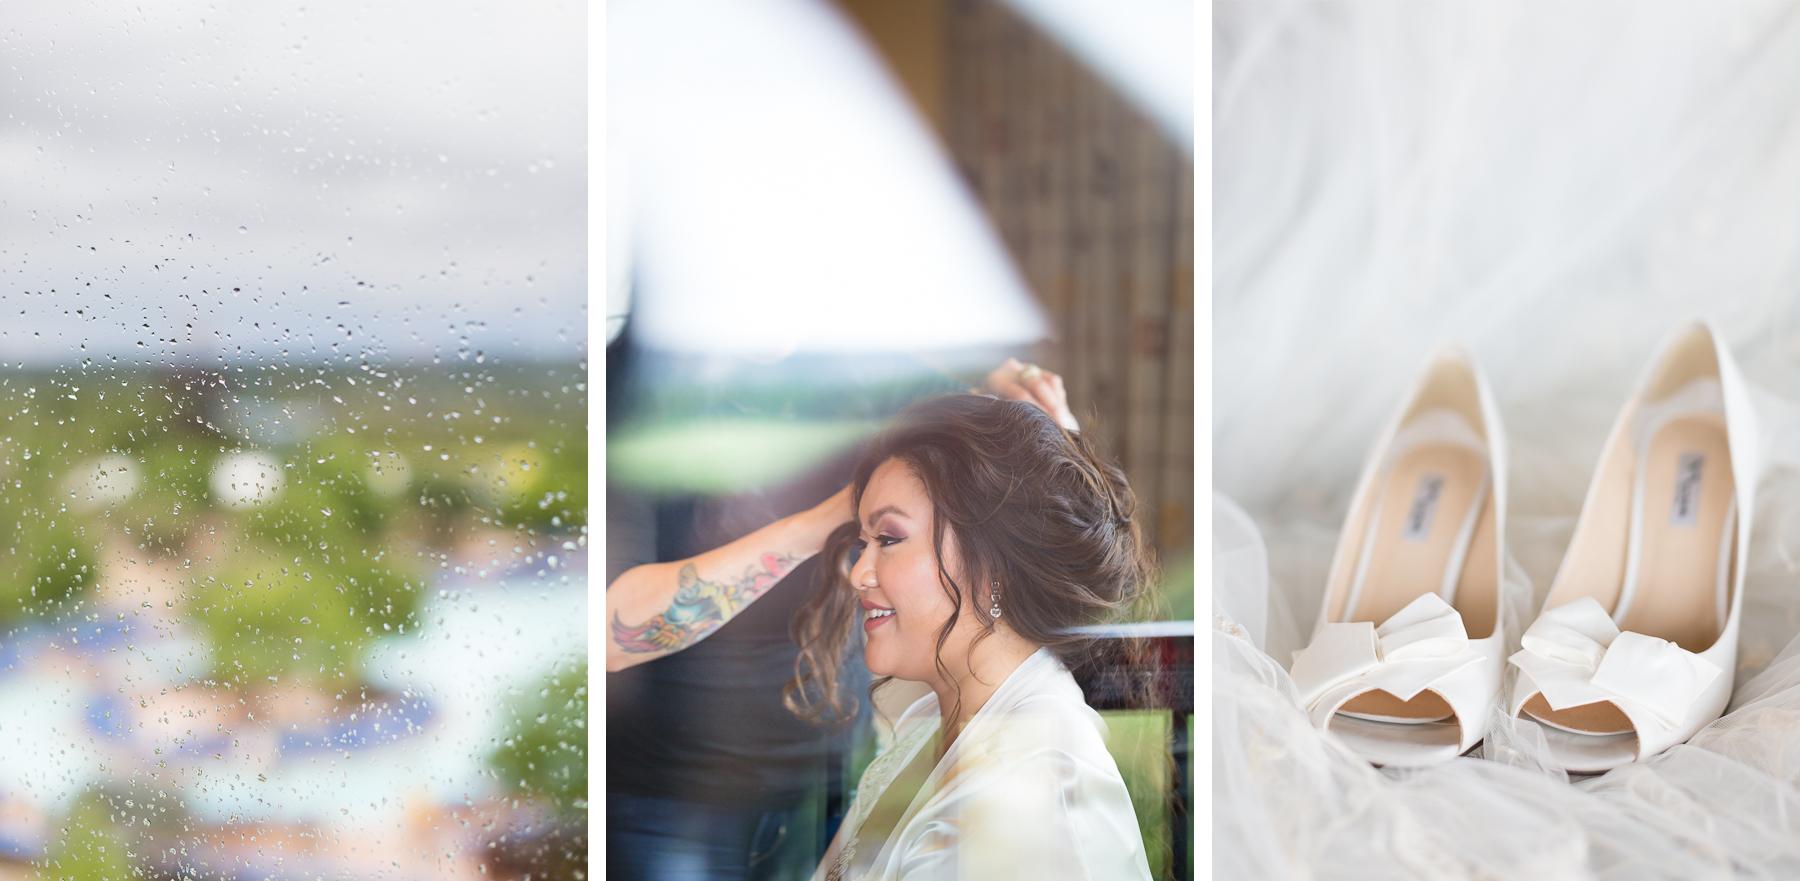 rain-wedding-photo-ideas.jpg